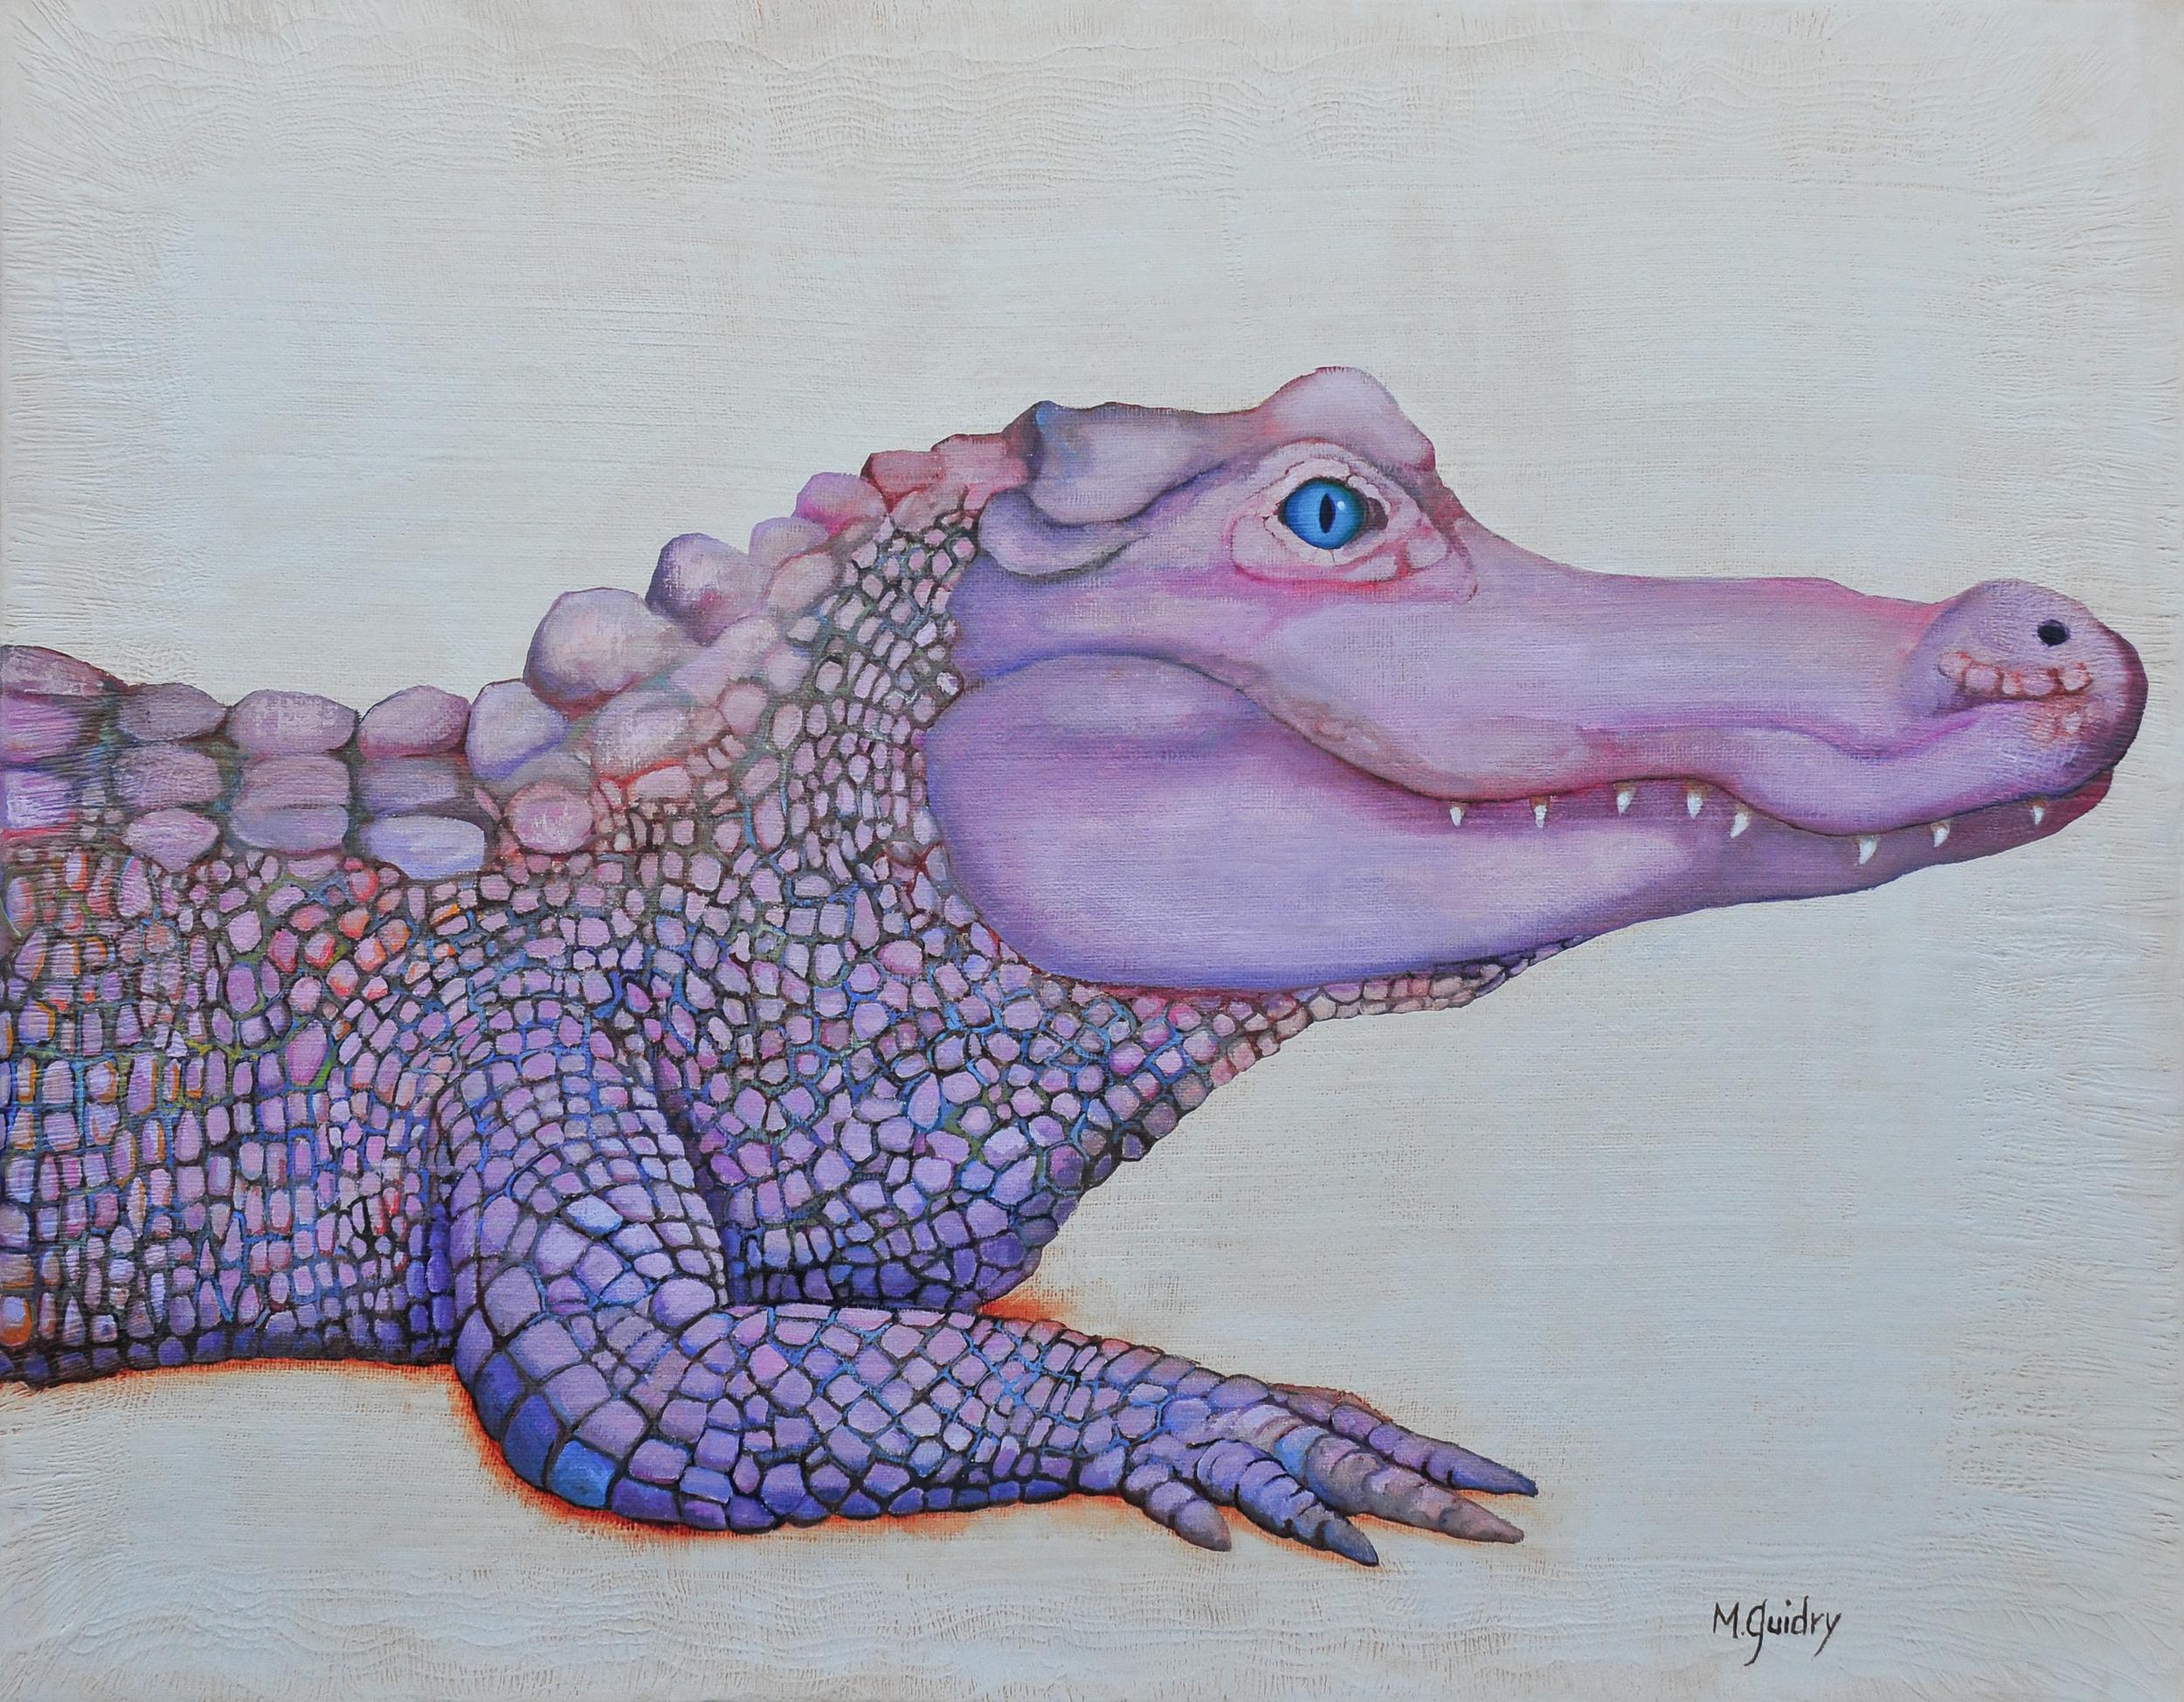 Pink_Alligator_louisiana_m.guidry_michael_guidry_oil_painting_marsh_new_orleans_artist.jpg.jpg